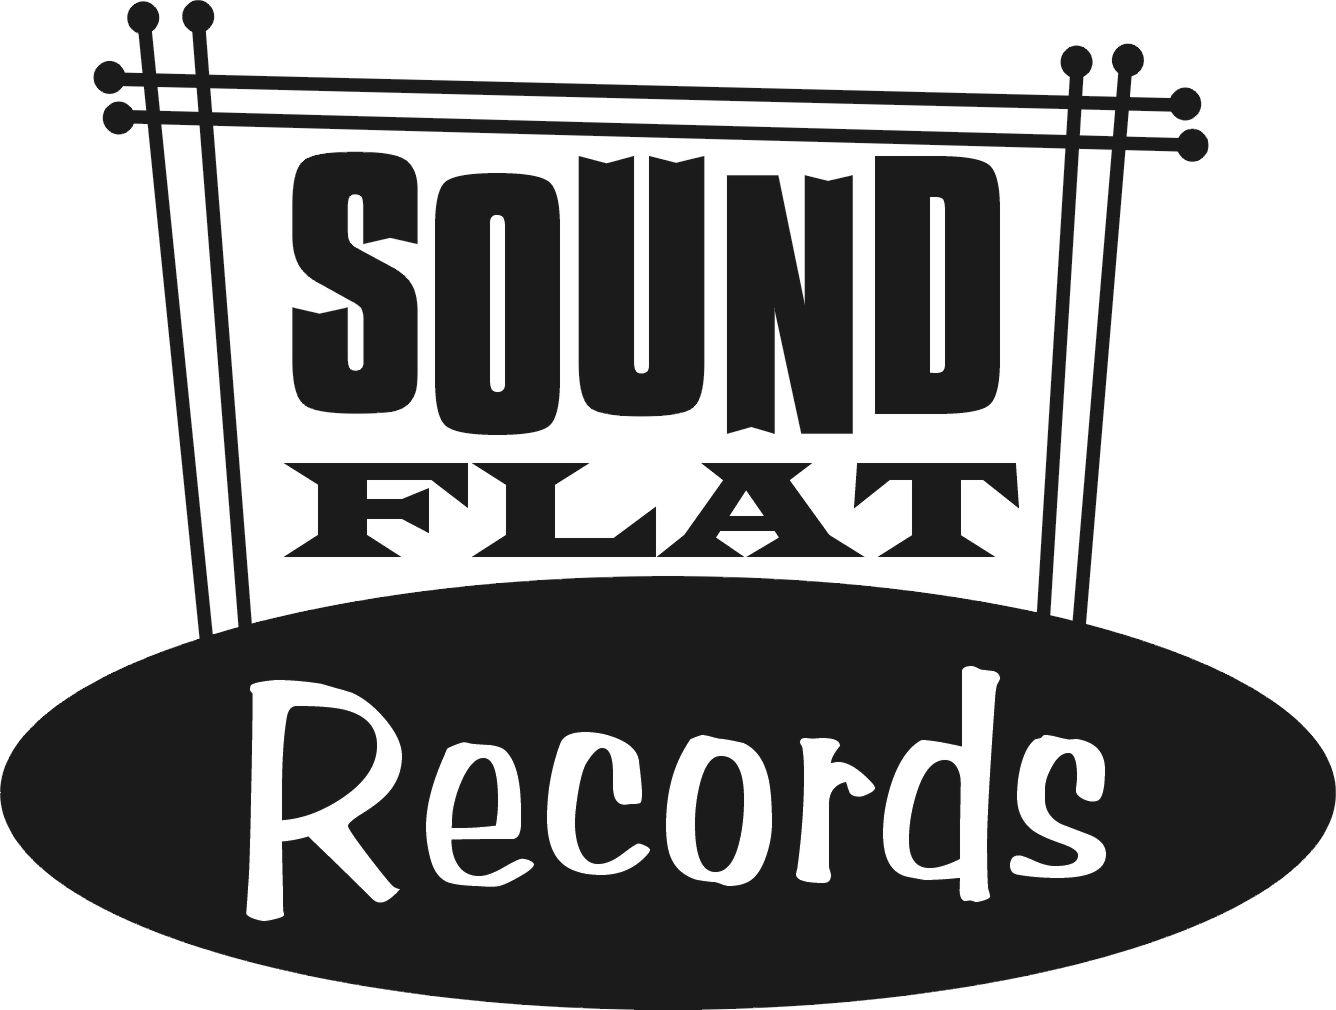 soundflat logo 50s